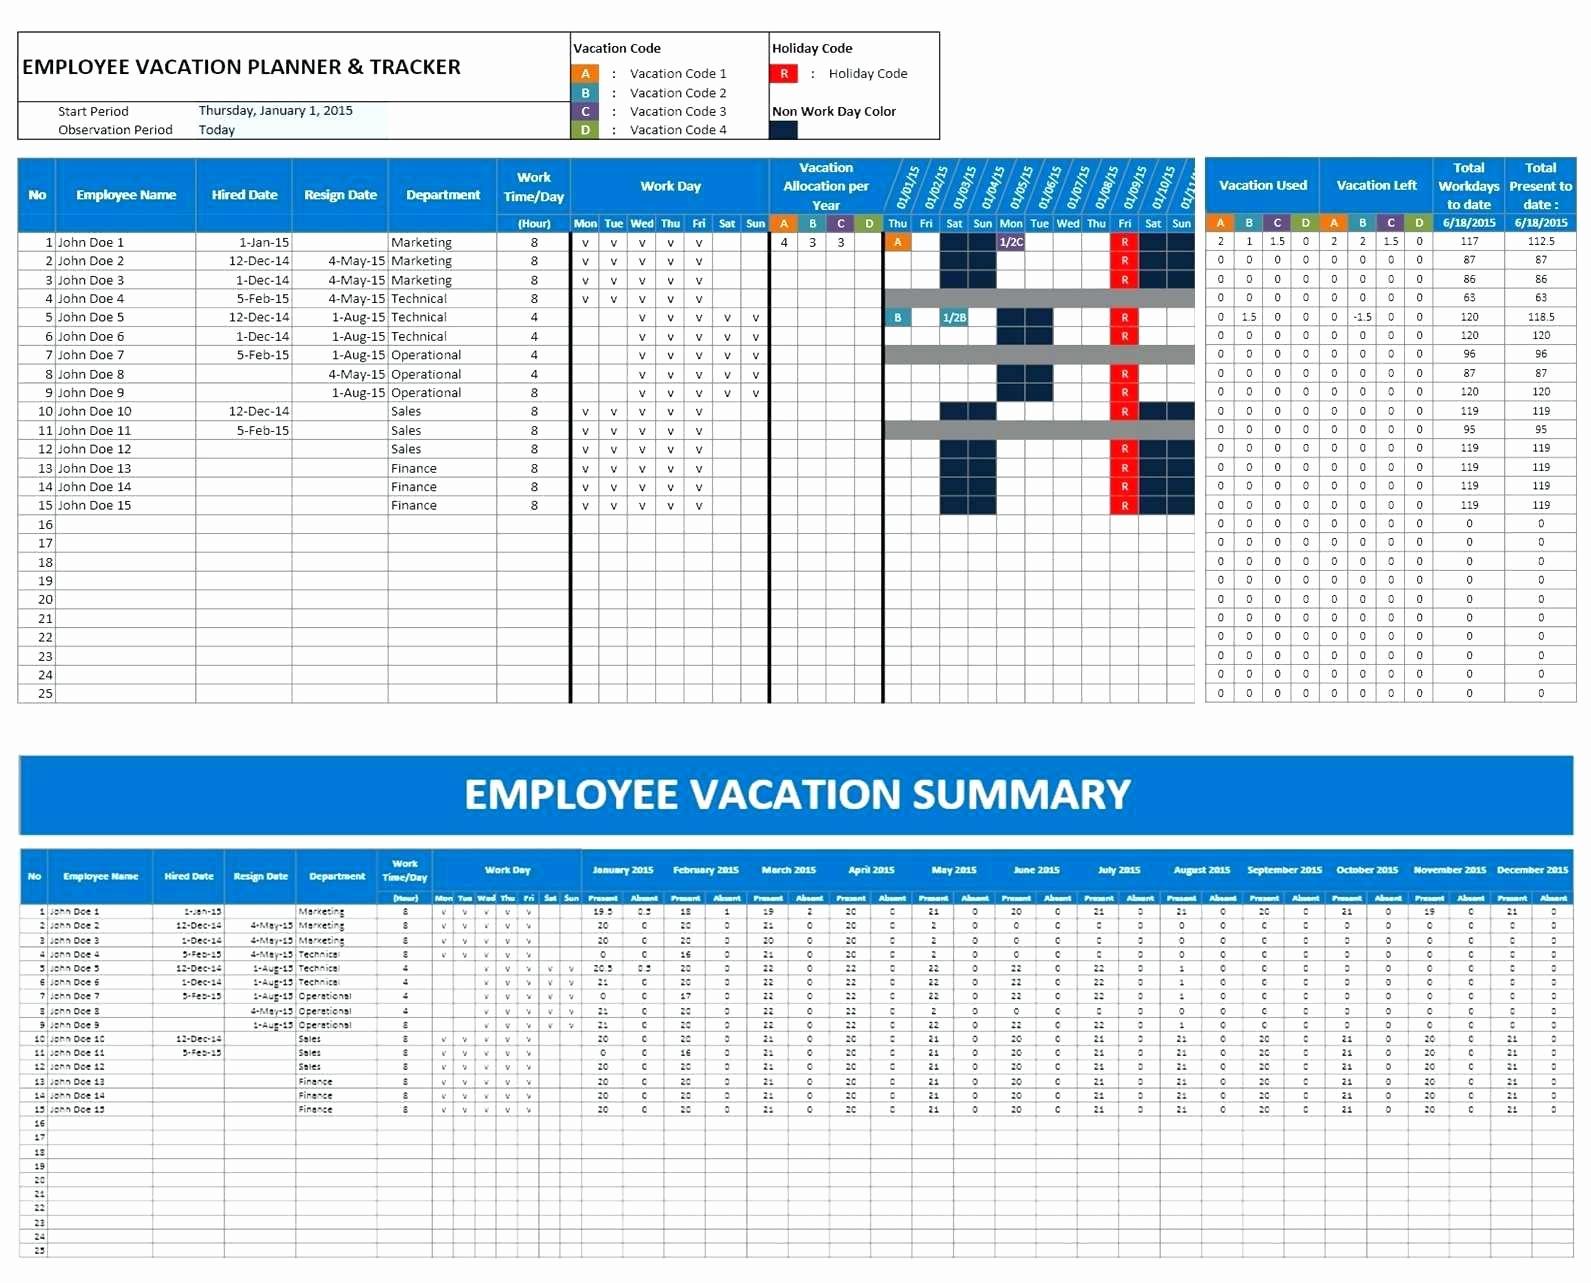 Annual Leave Spreadsheet Spreadsheet Downloa Annual Leave Spreadsheet Download Annual Leave